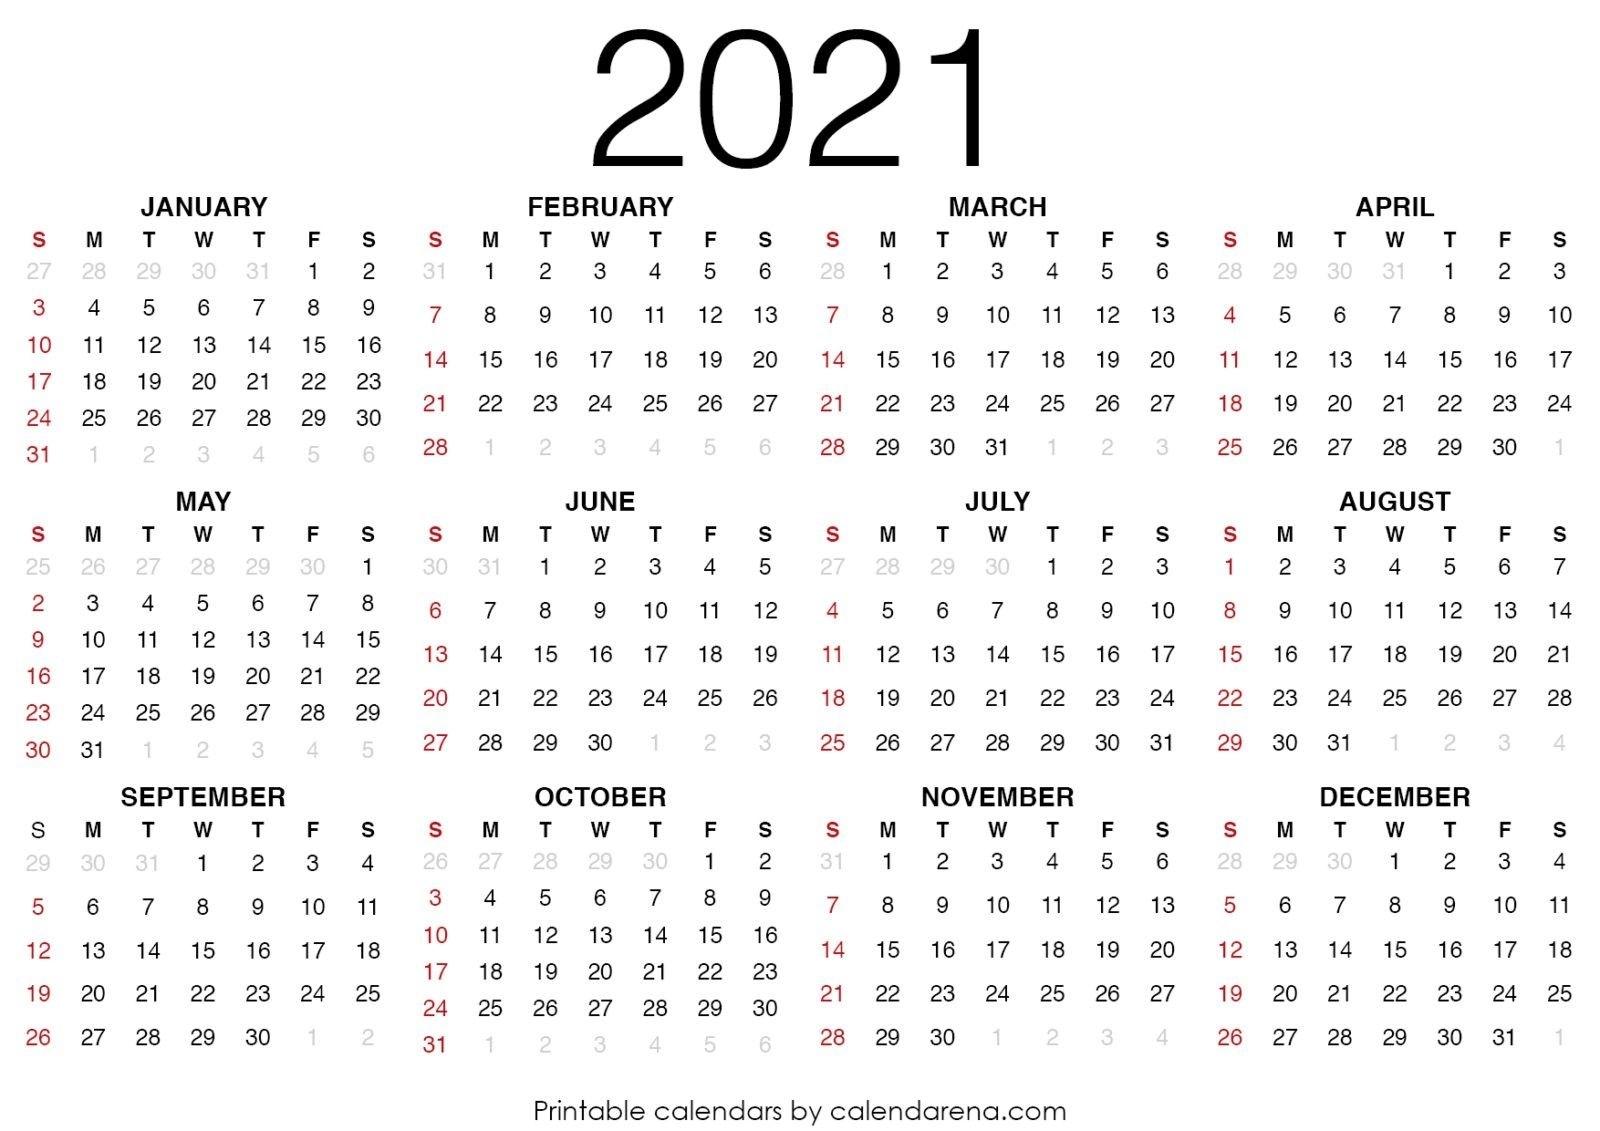 Pin On Calendarena